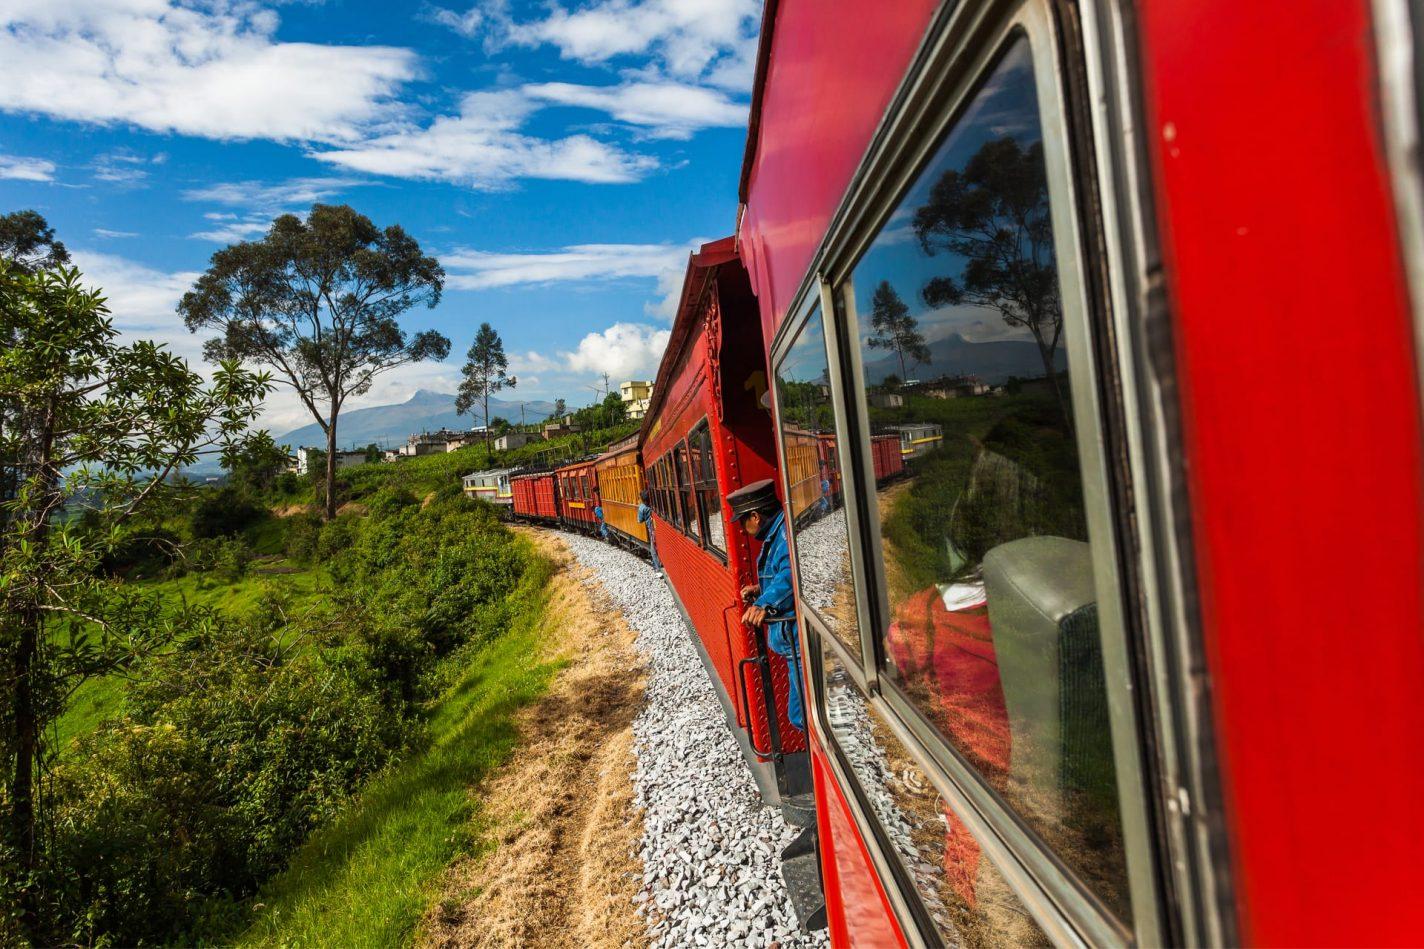 Treinreis door Ecuador - Wat te doen in Ecuador?